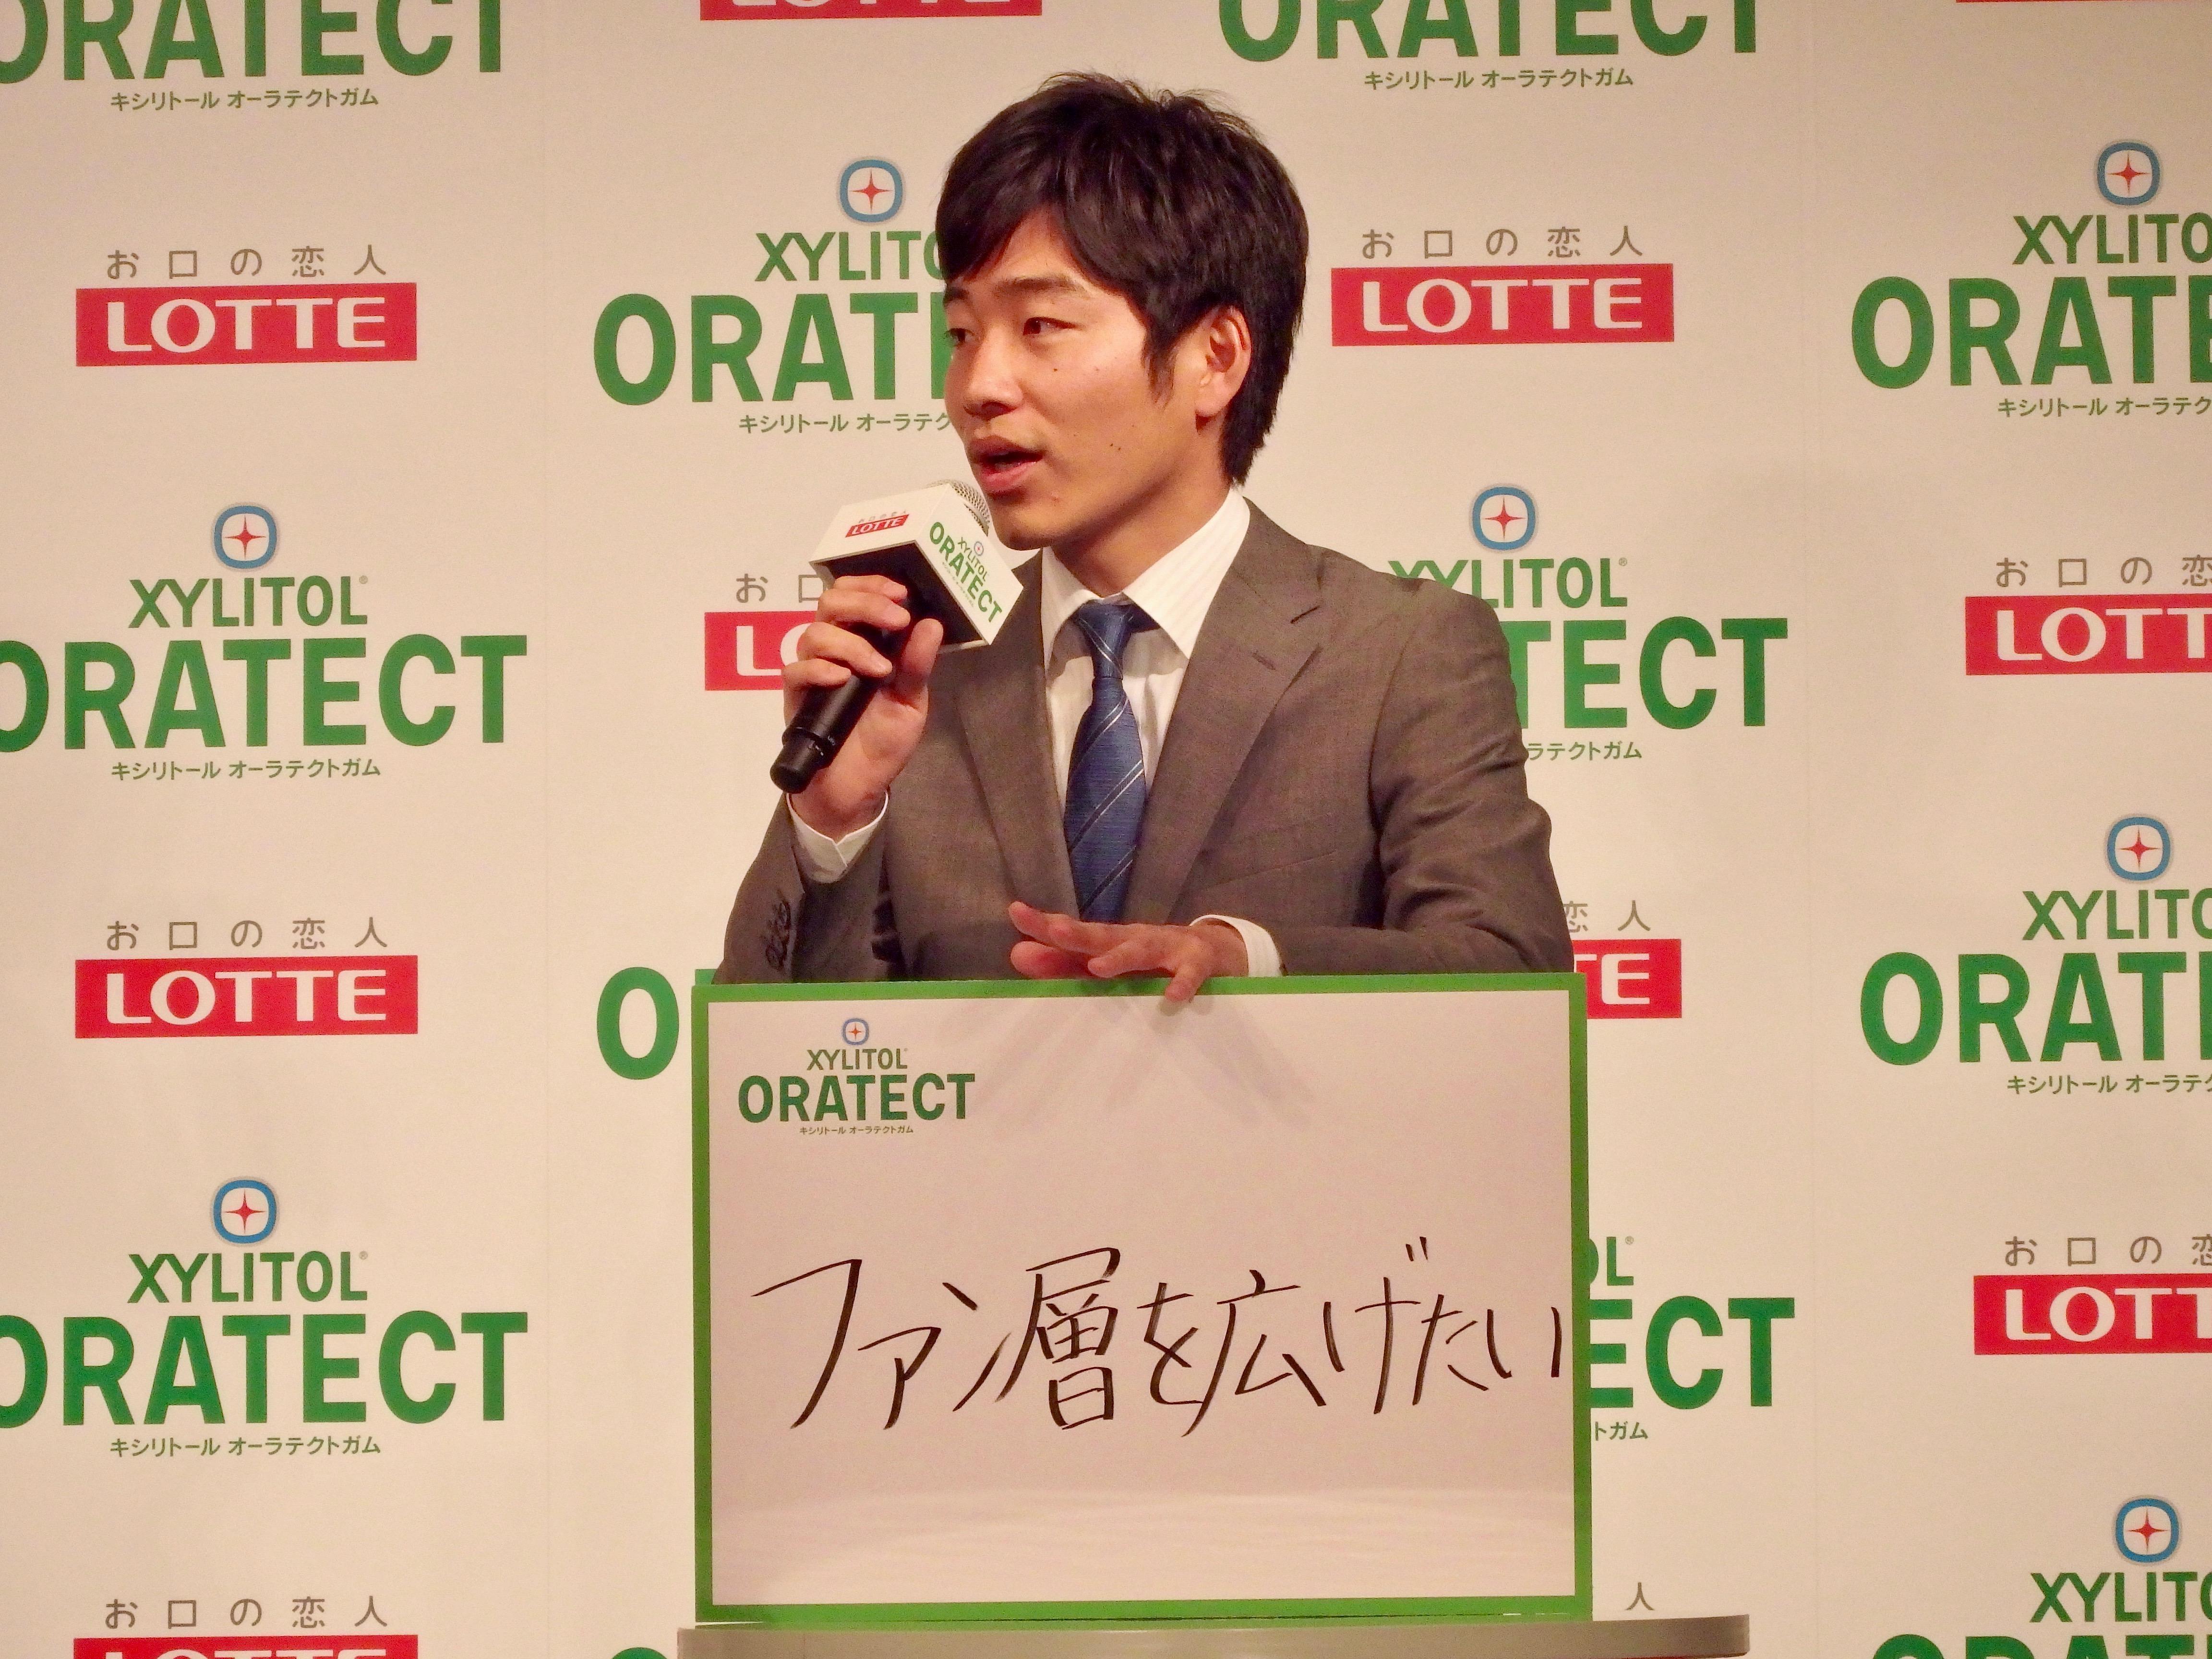 http://news.yoshimoto.co.jp/20170314202515-cf342dfc5734f02bfce82b6442617556e3c46e40.jpg